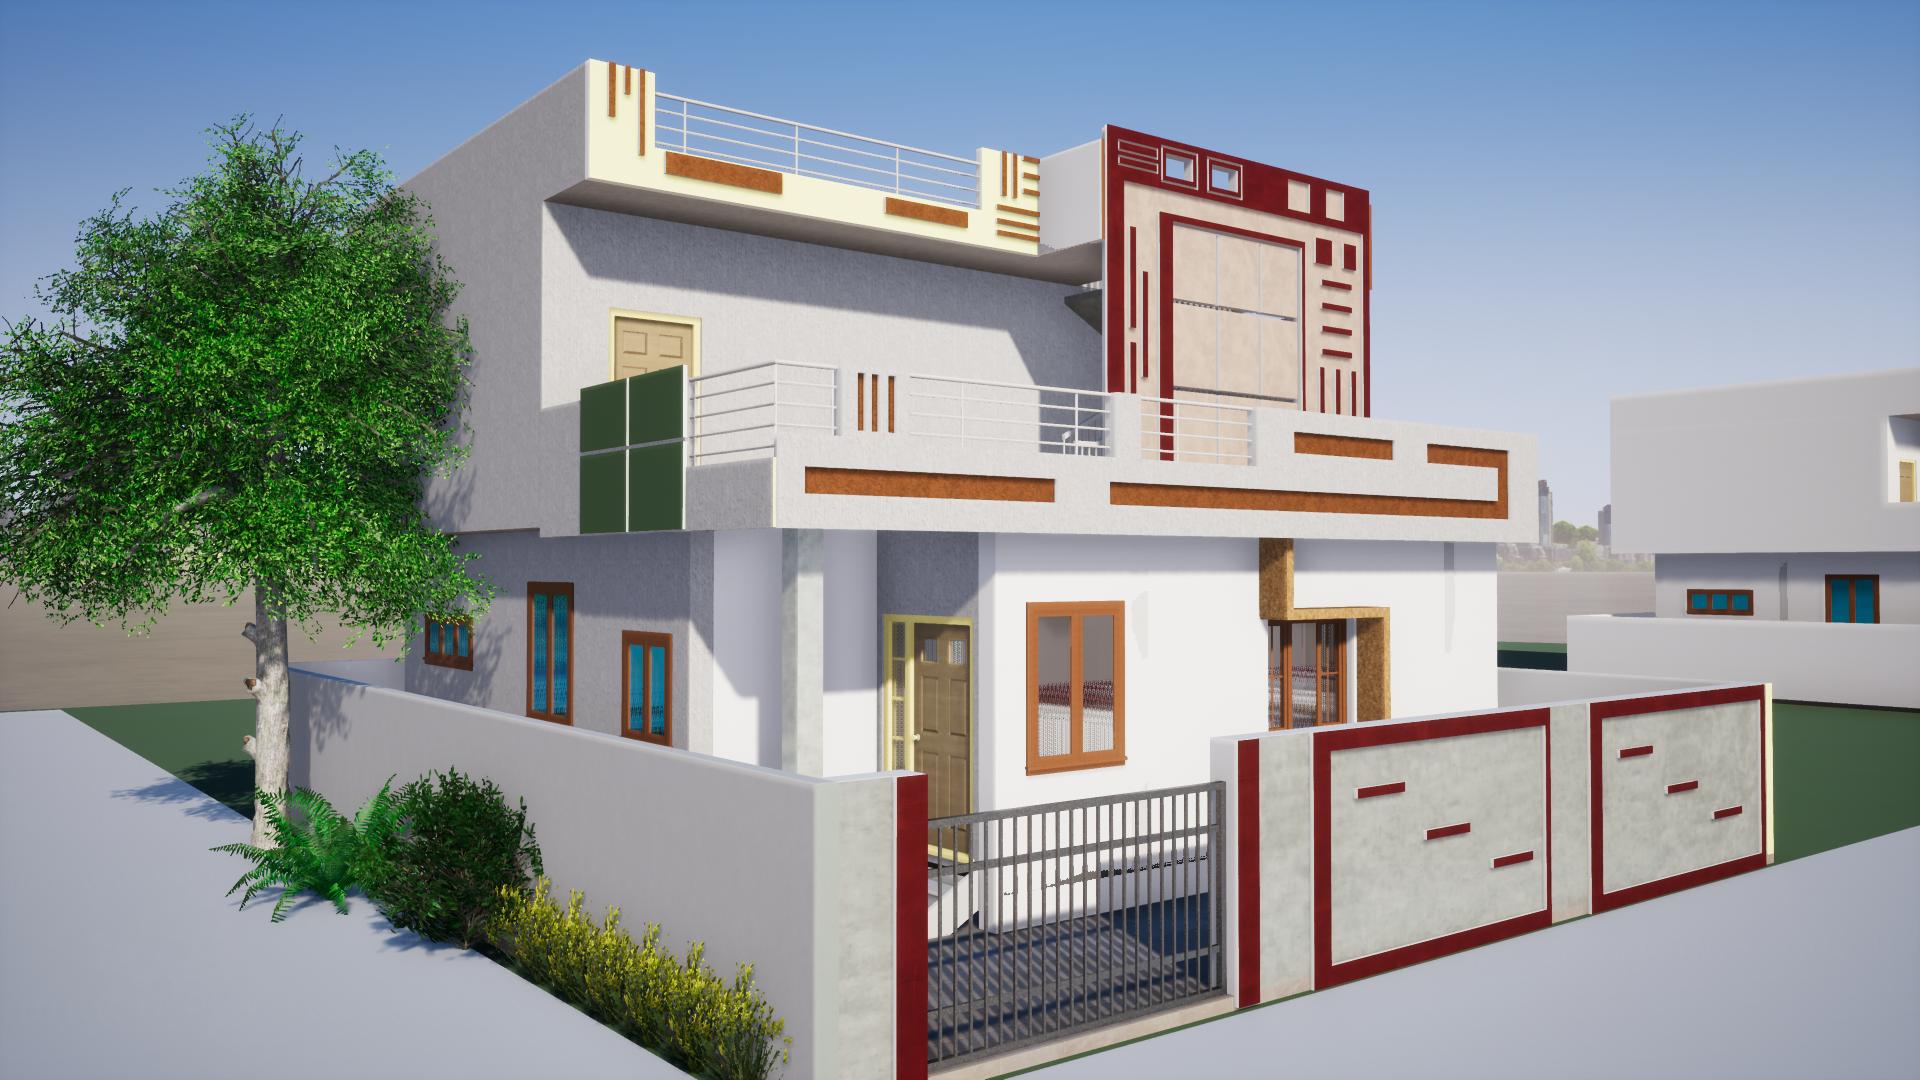 New Elevation Design I Designed Using Revit Software House Styles House Design House